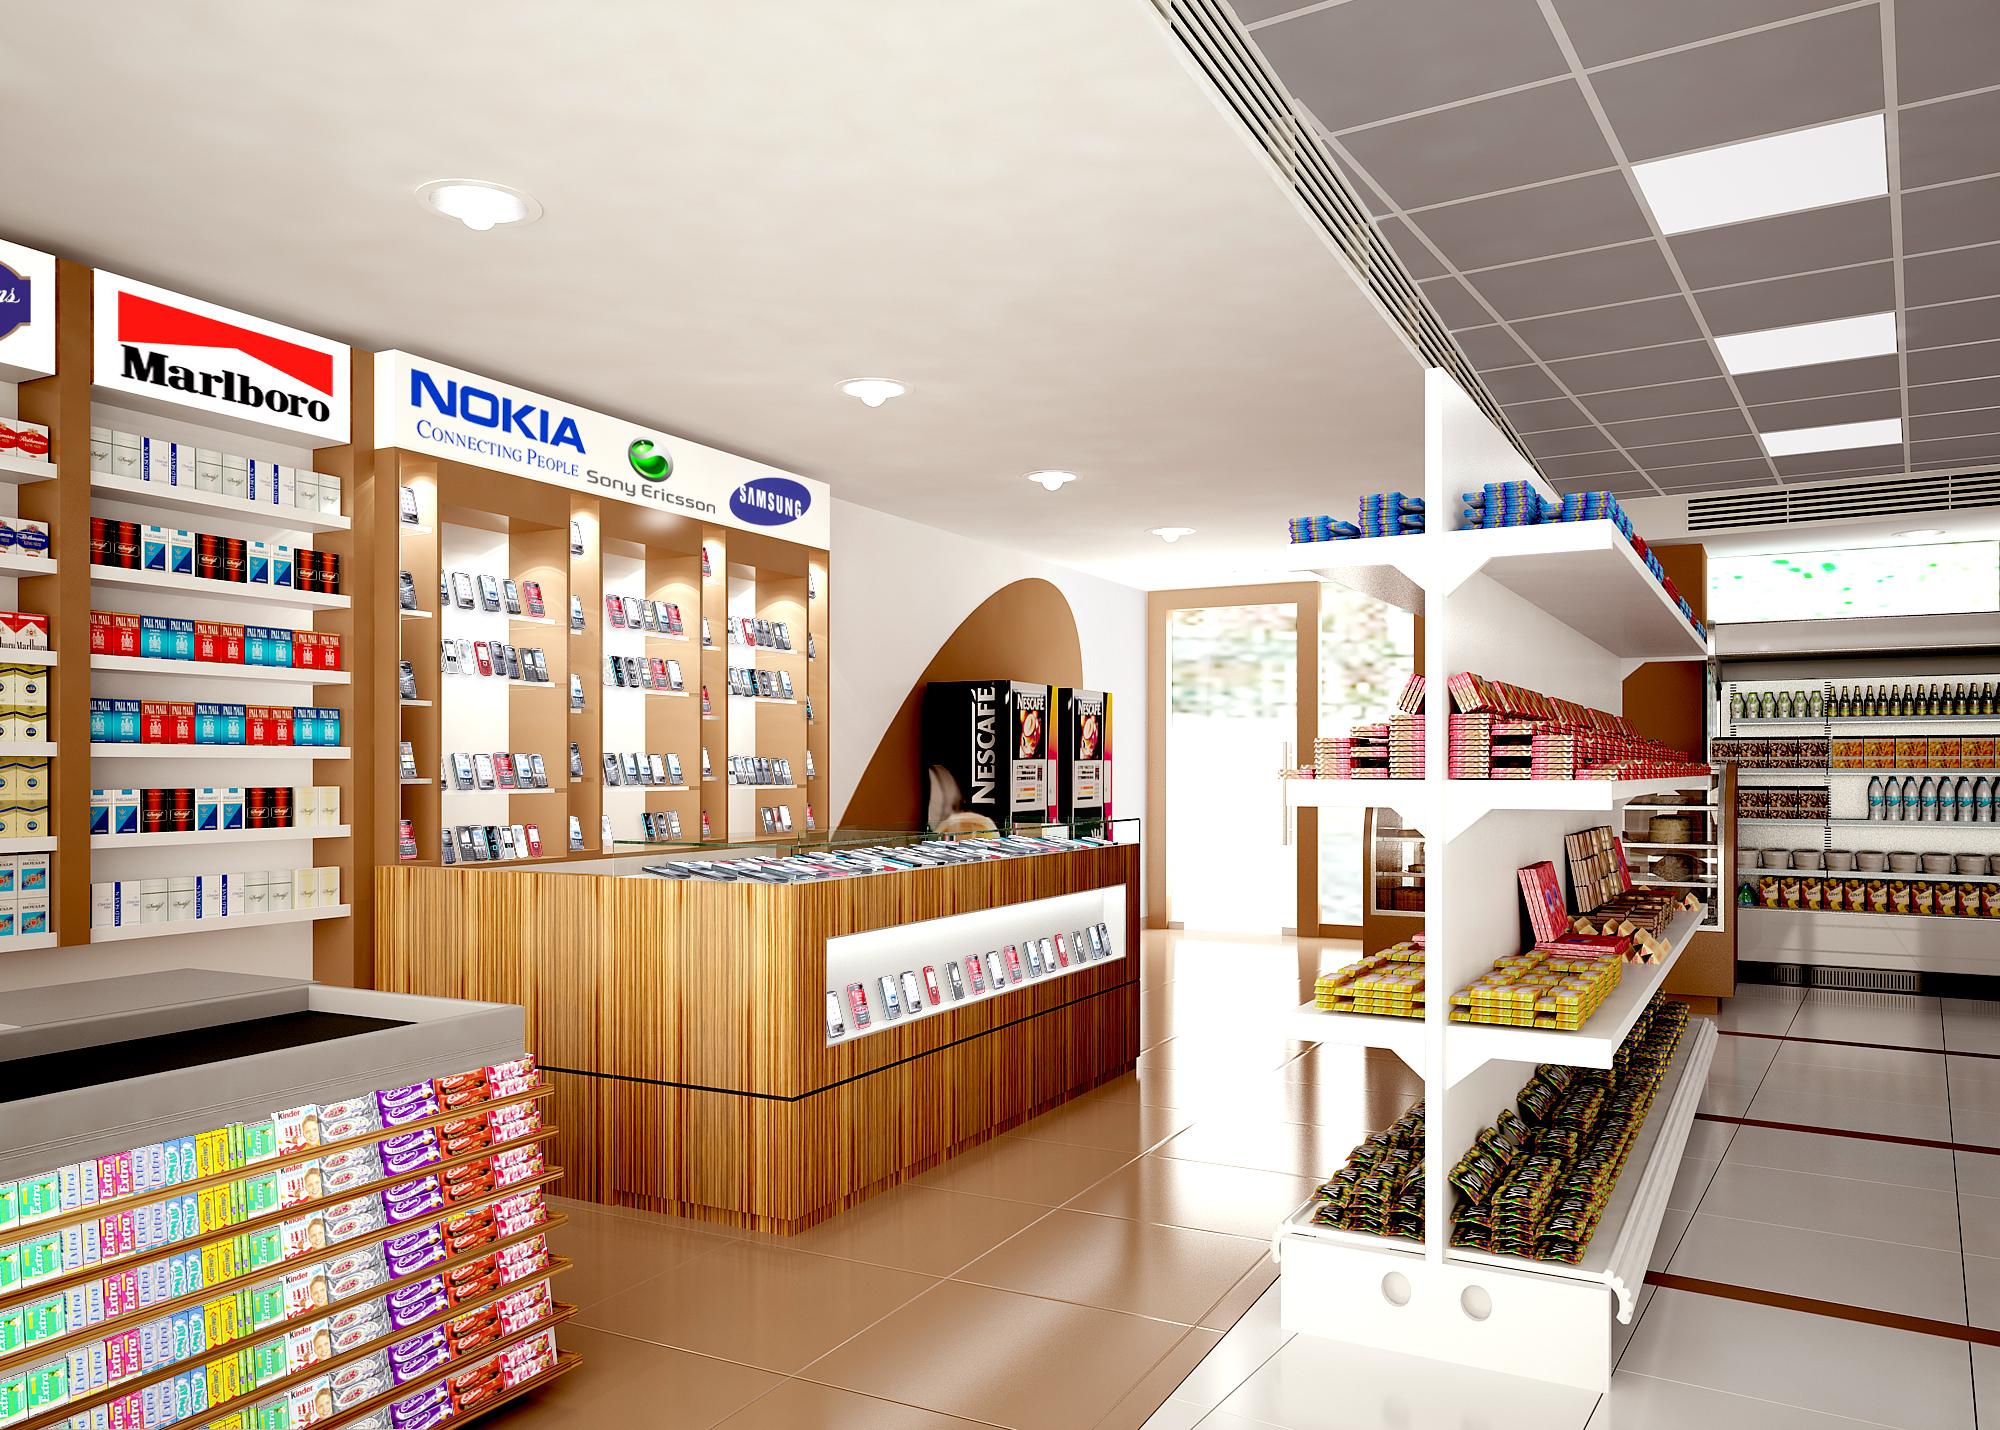 Retail Interior By NASEEM RAHMAN At Coroflot